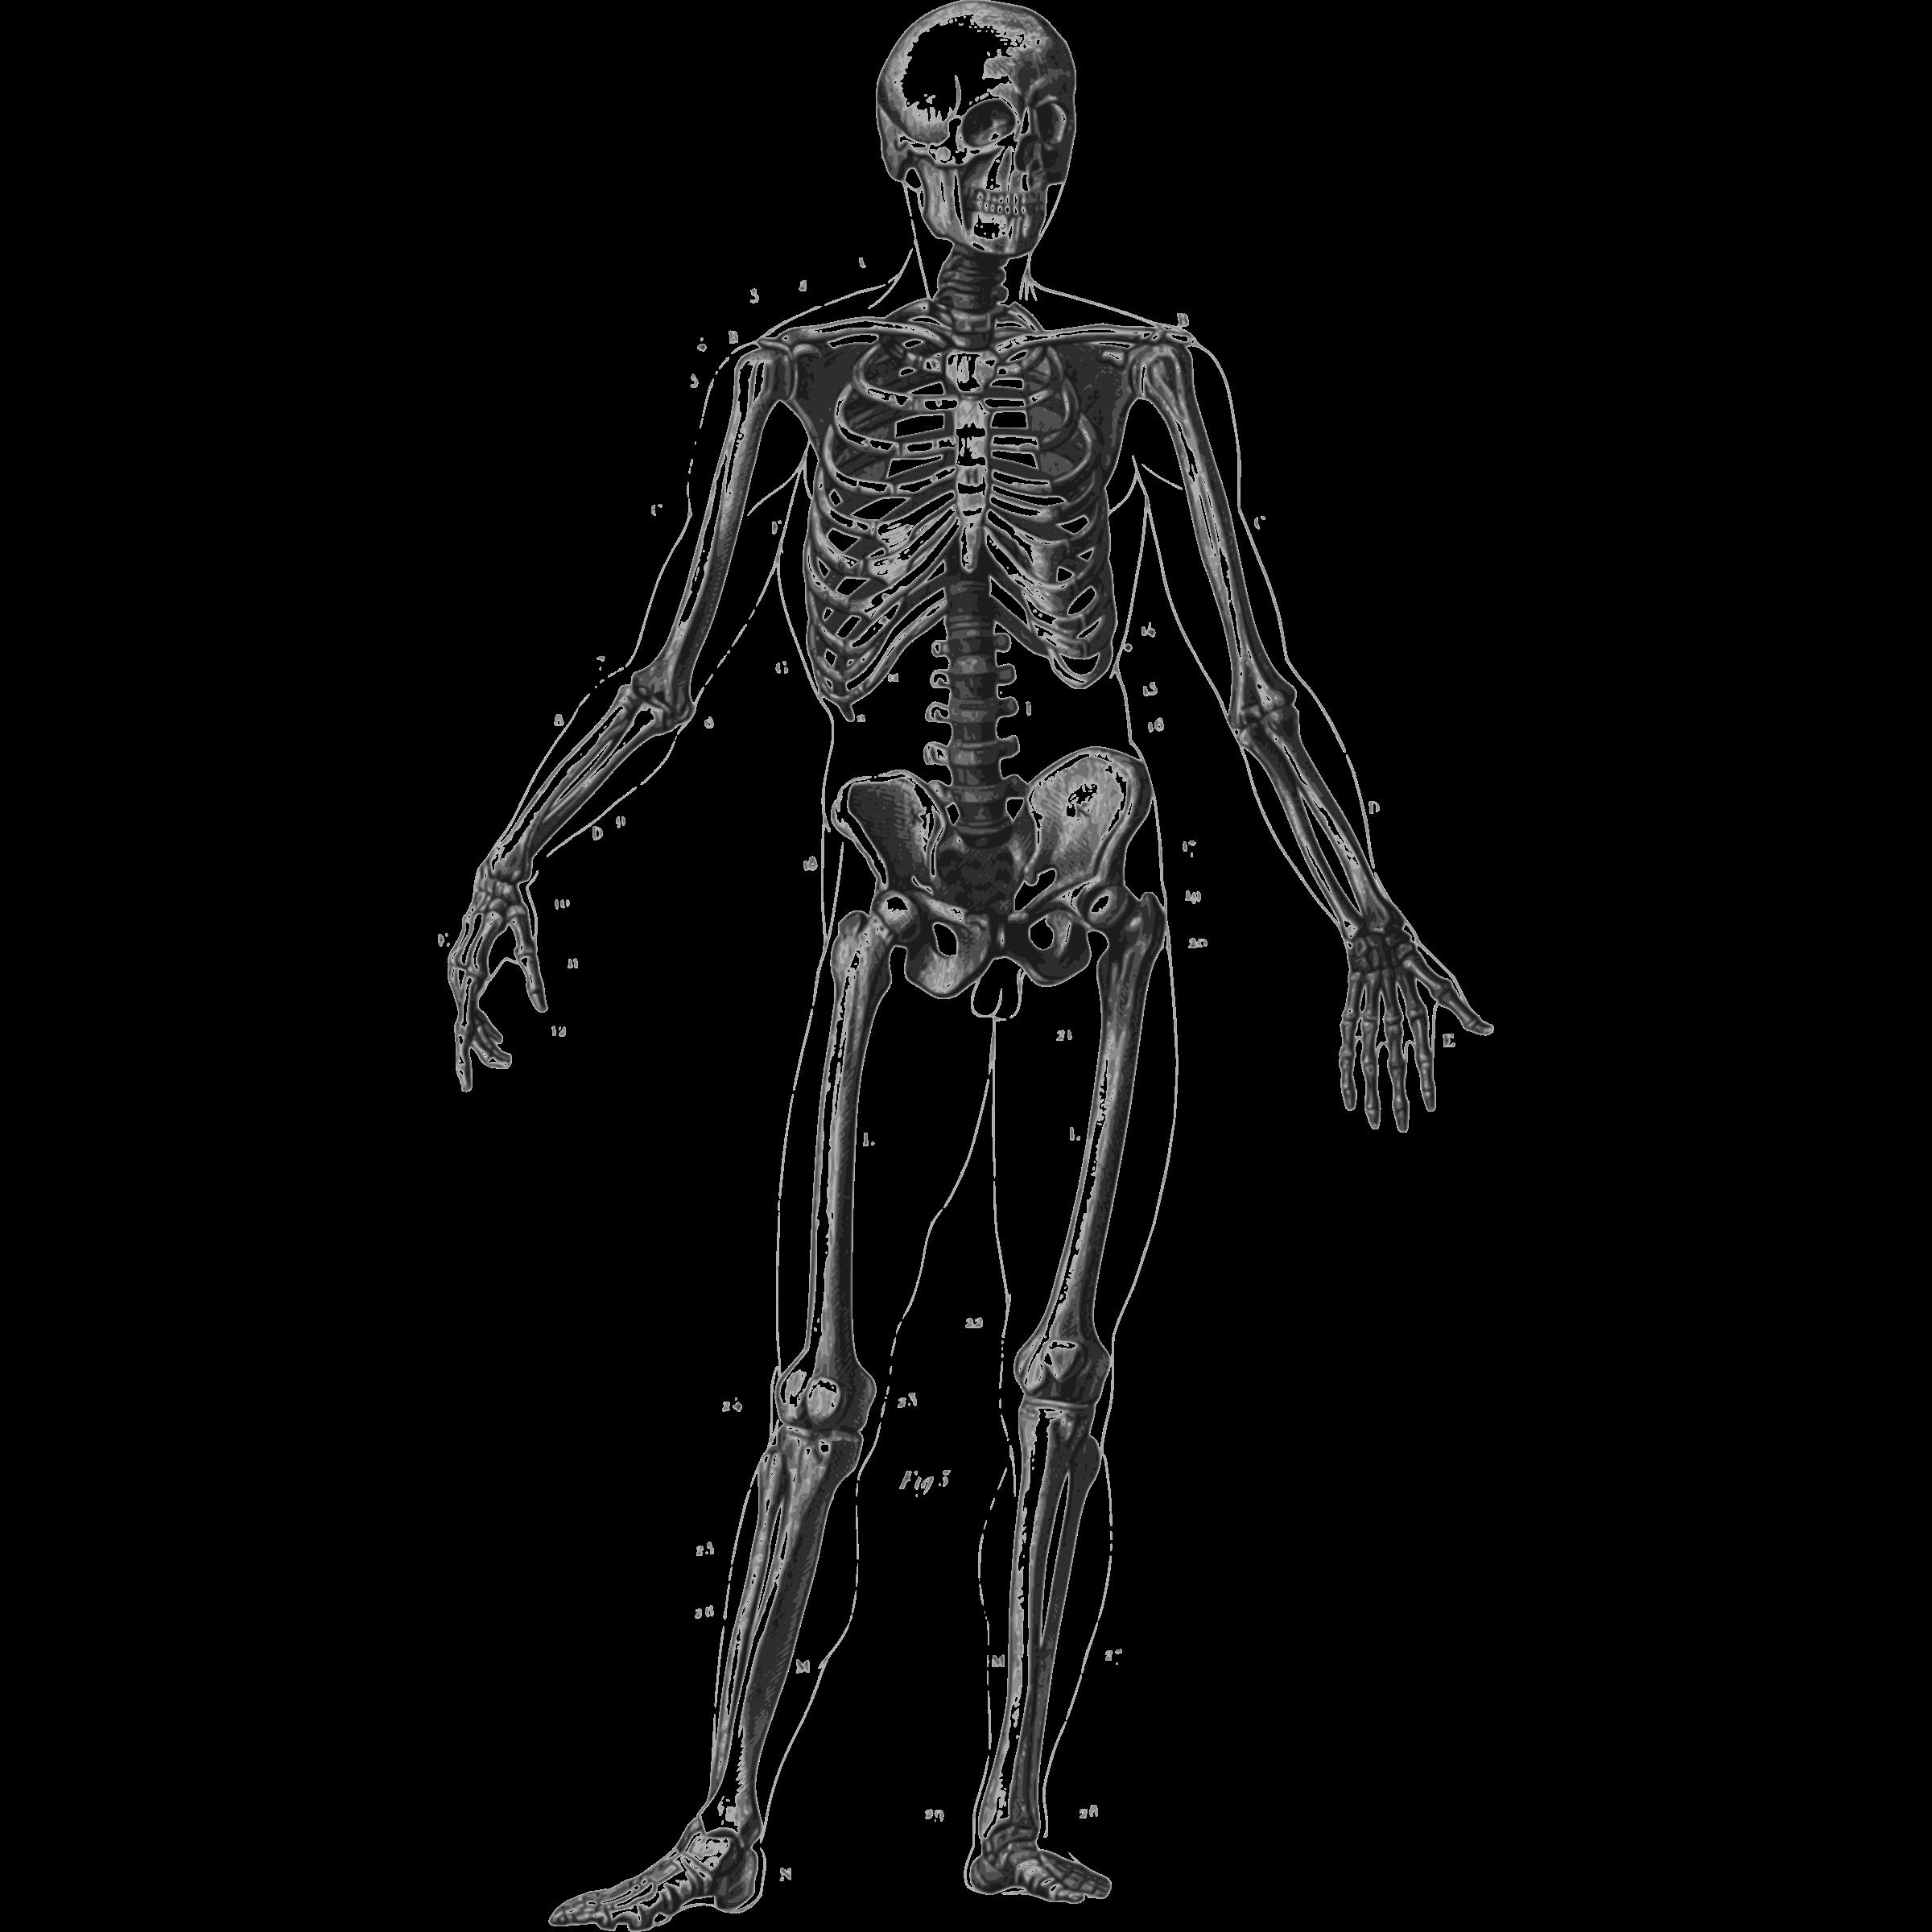 Bones clipart human biology Skeleton human com clipart Cliparting